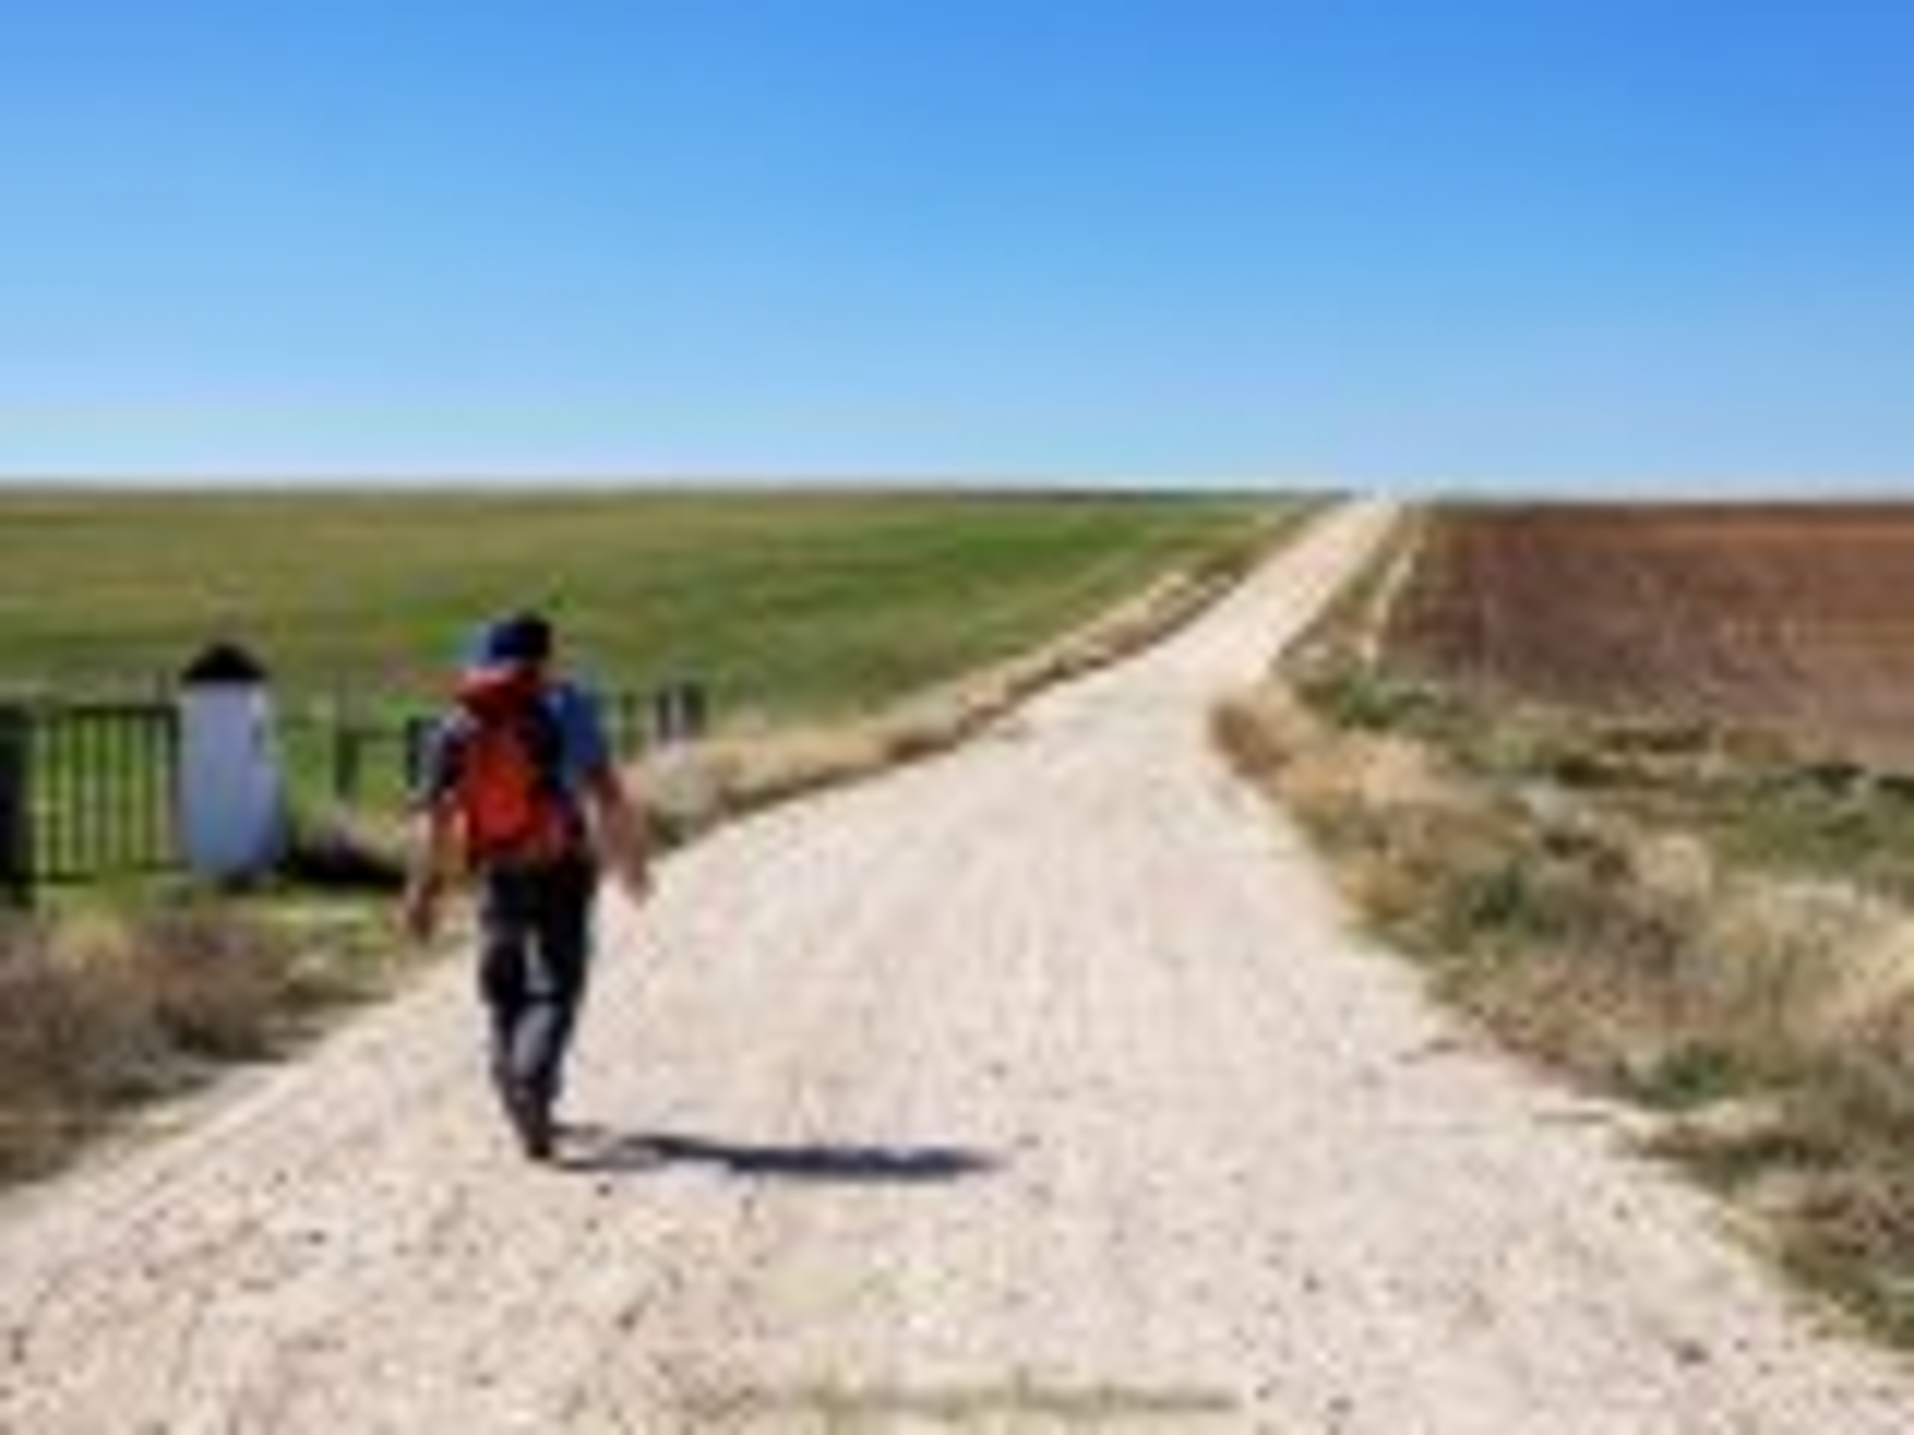 Day Four ~ Narros del Castillo to Mancera de Abajo, 14.1 Kilometers